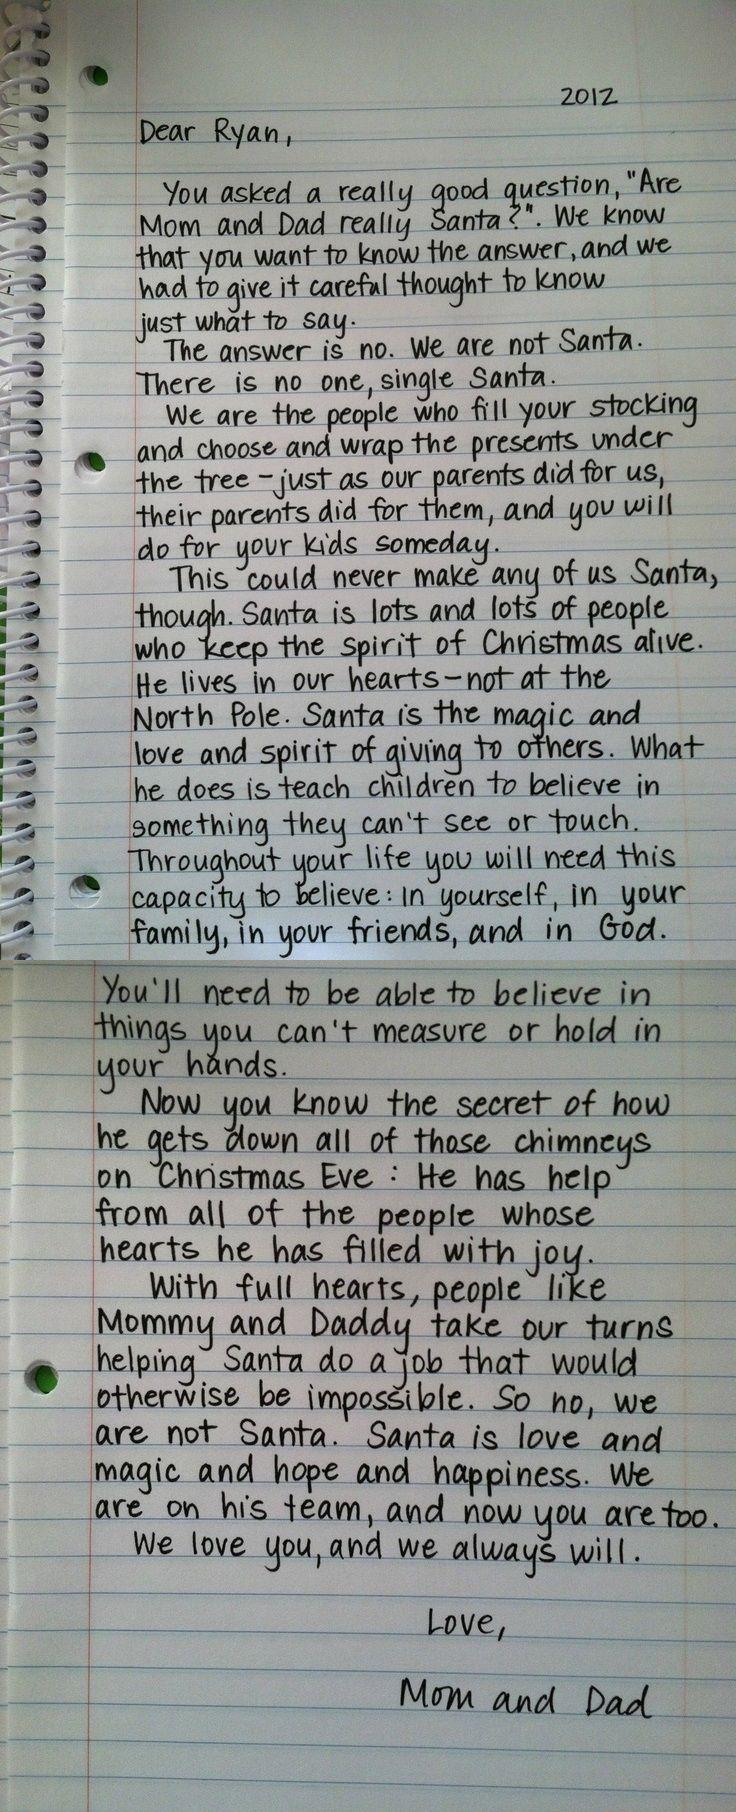 Perfect Santa explanation